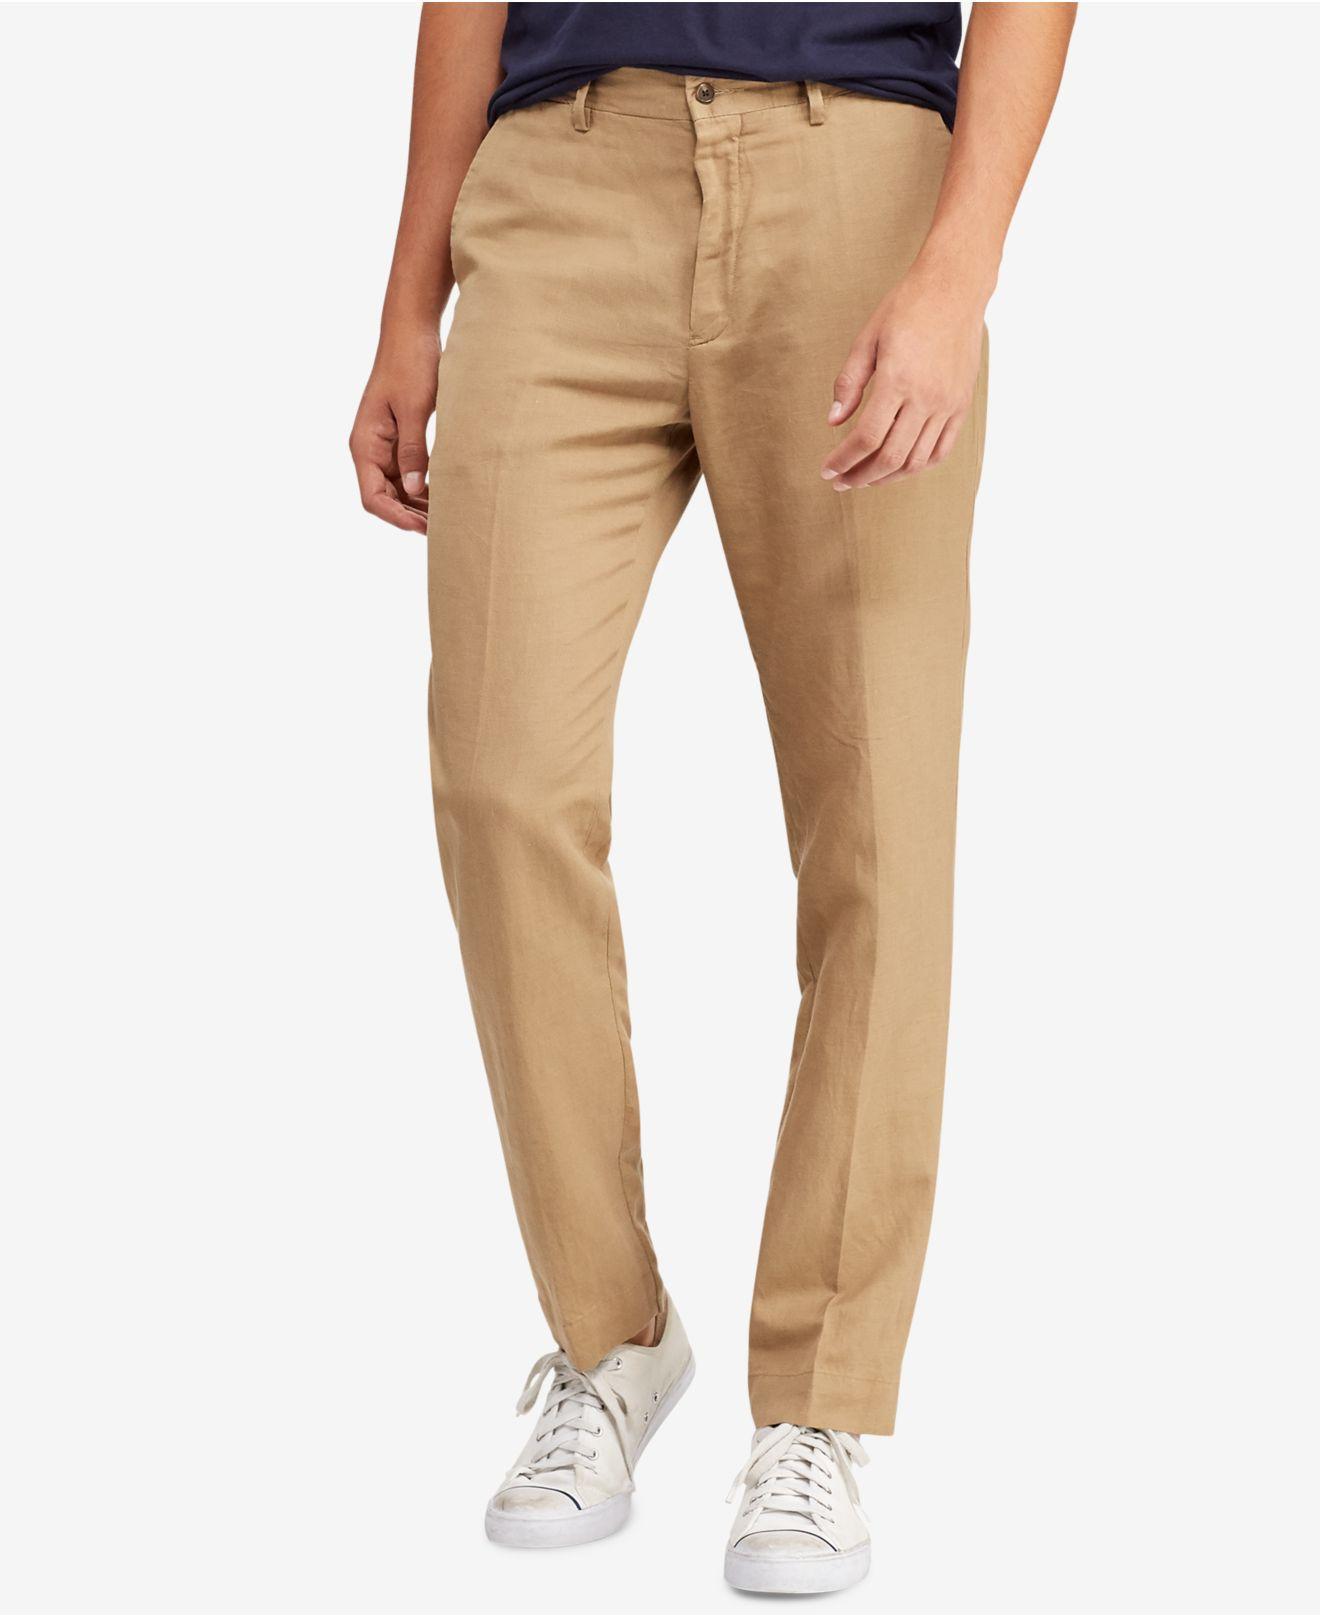 e889ec3db Lyst - Polo Ralph Lauren Newport Classic Fit Pants in Natural for Men